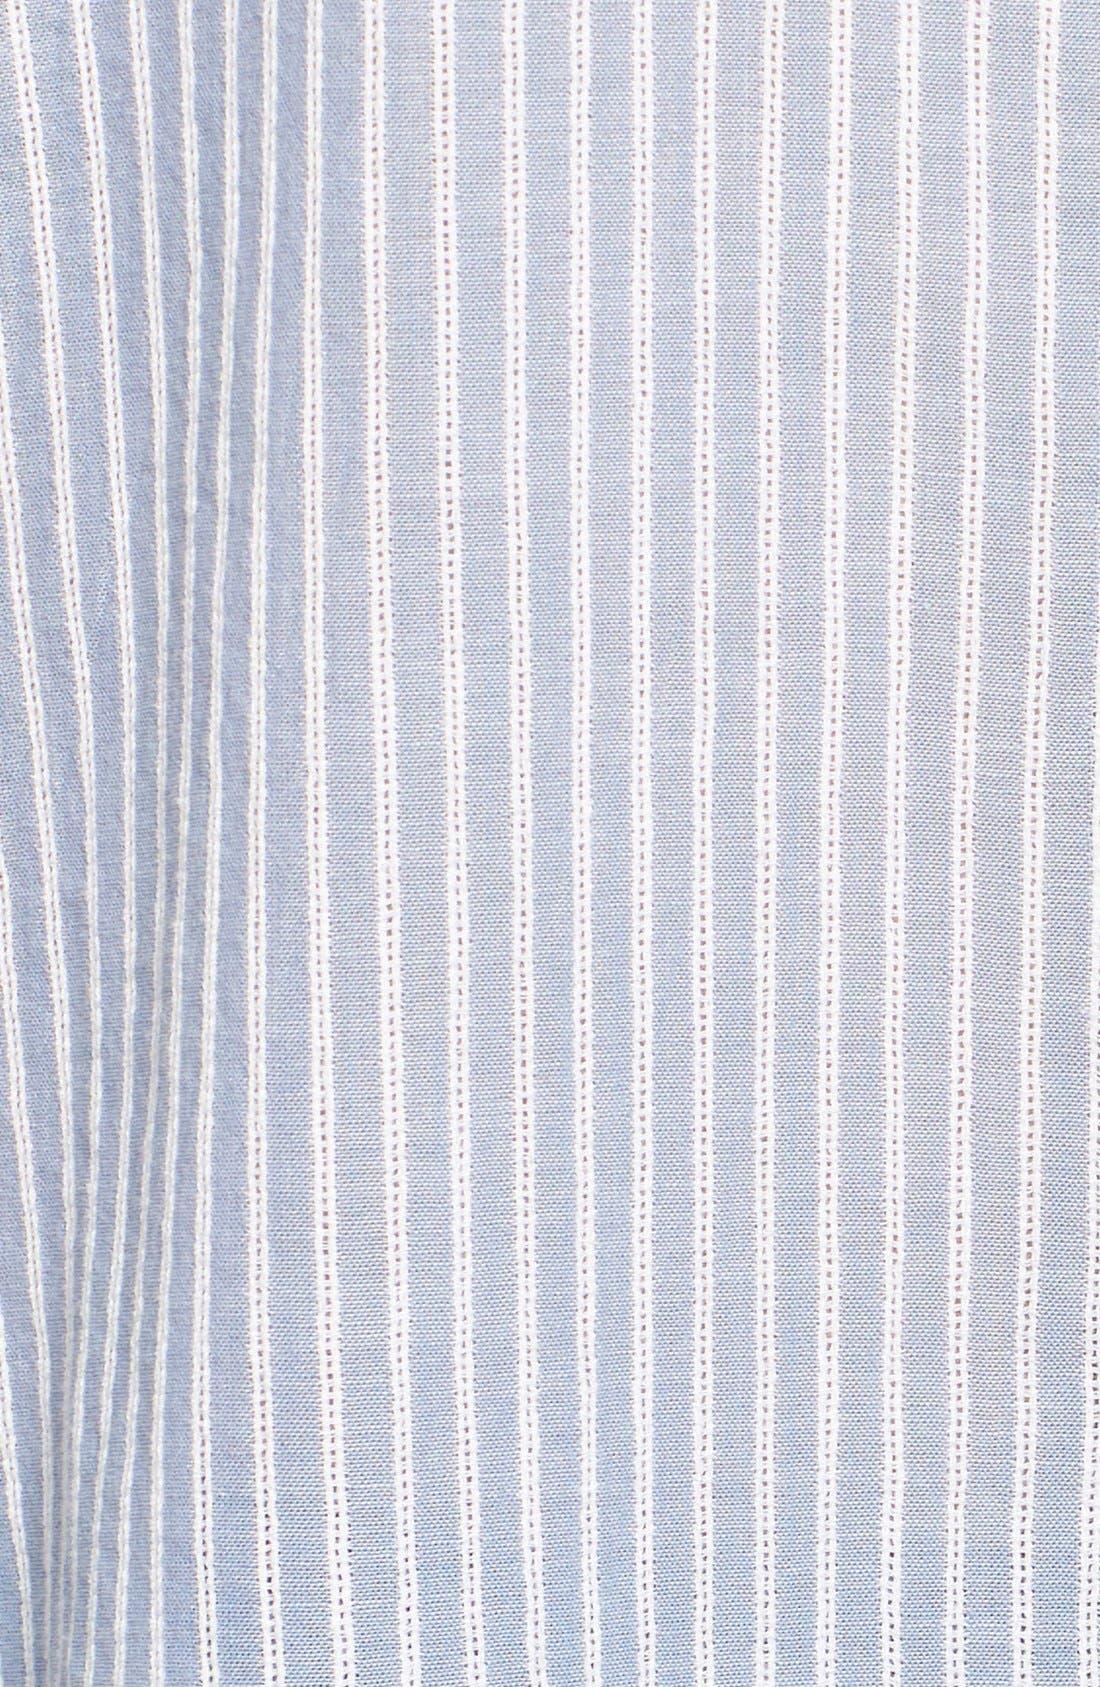 BEACHLUNCHLOUNGE, Beach Lunch Lounge Stripe Cotton Sleeveless Tunic, Alternate thumbnail 3, color, 400